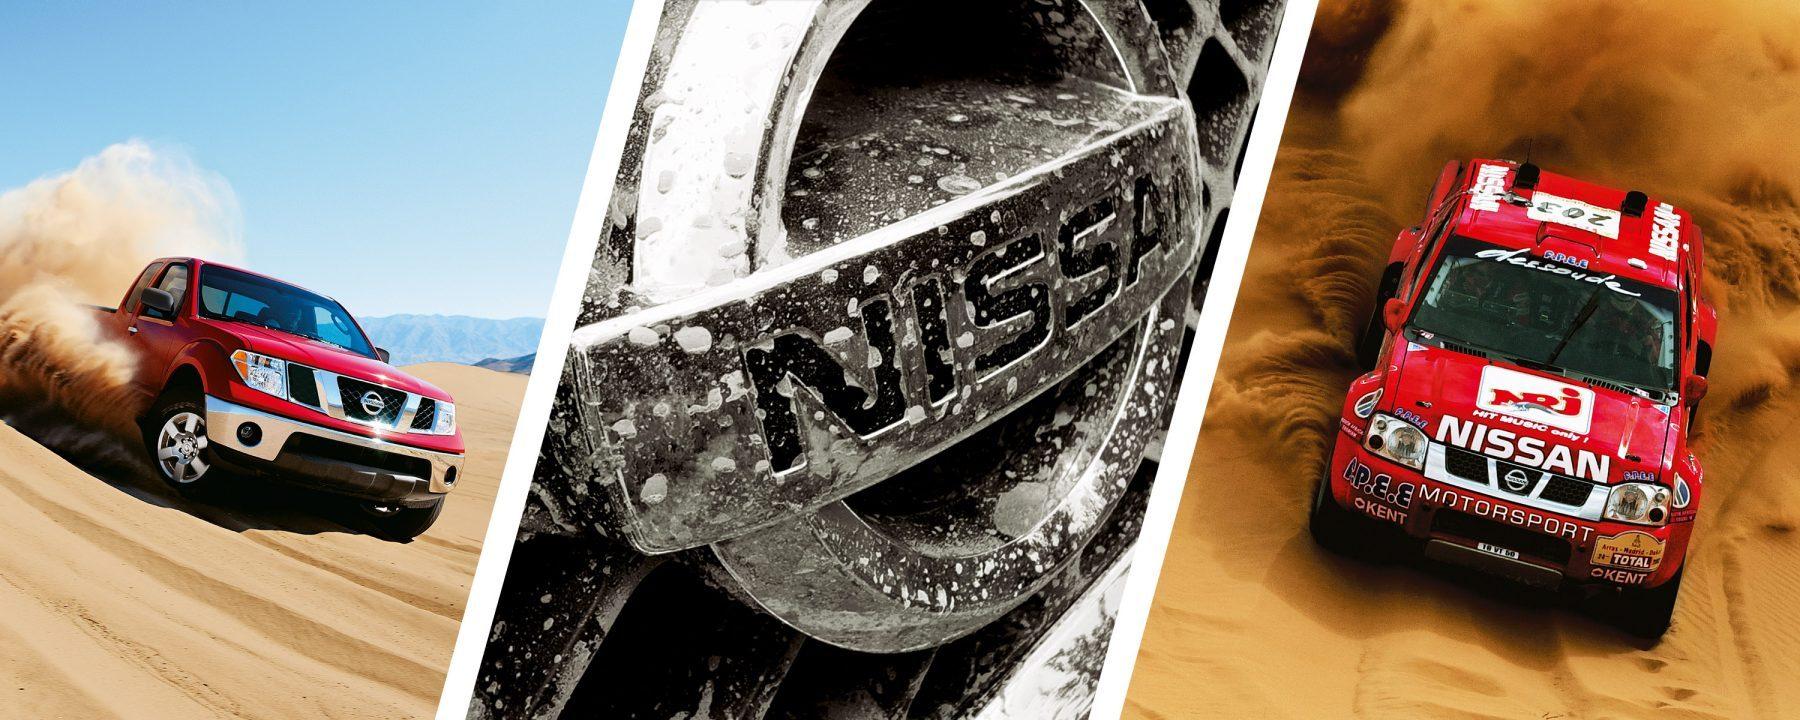 Nissan carousel image